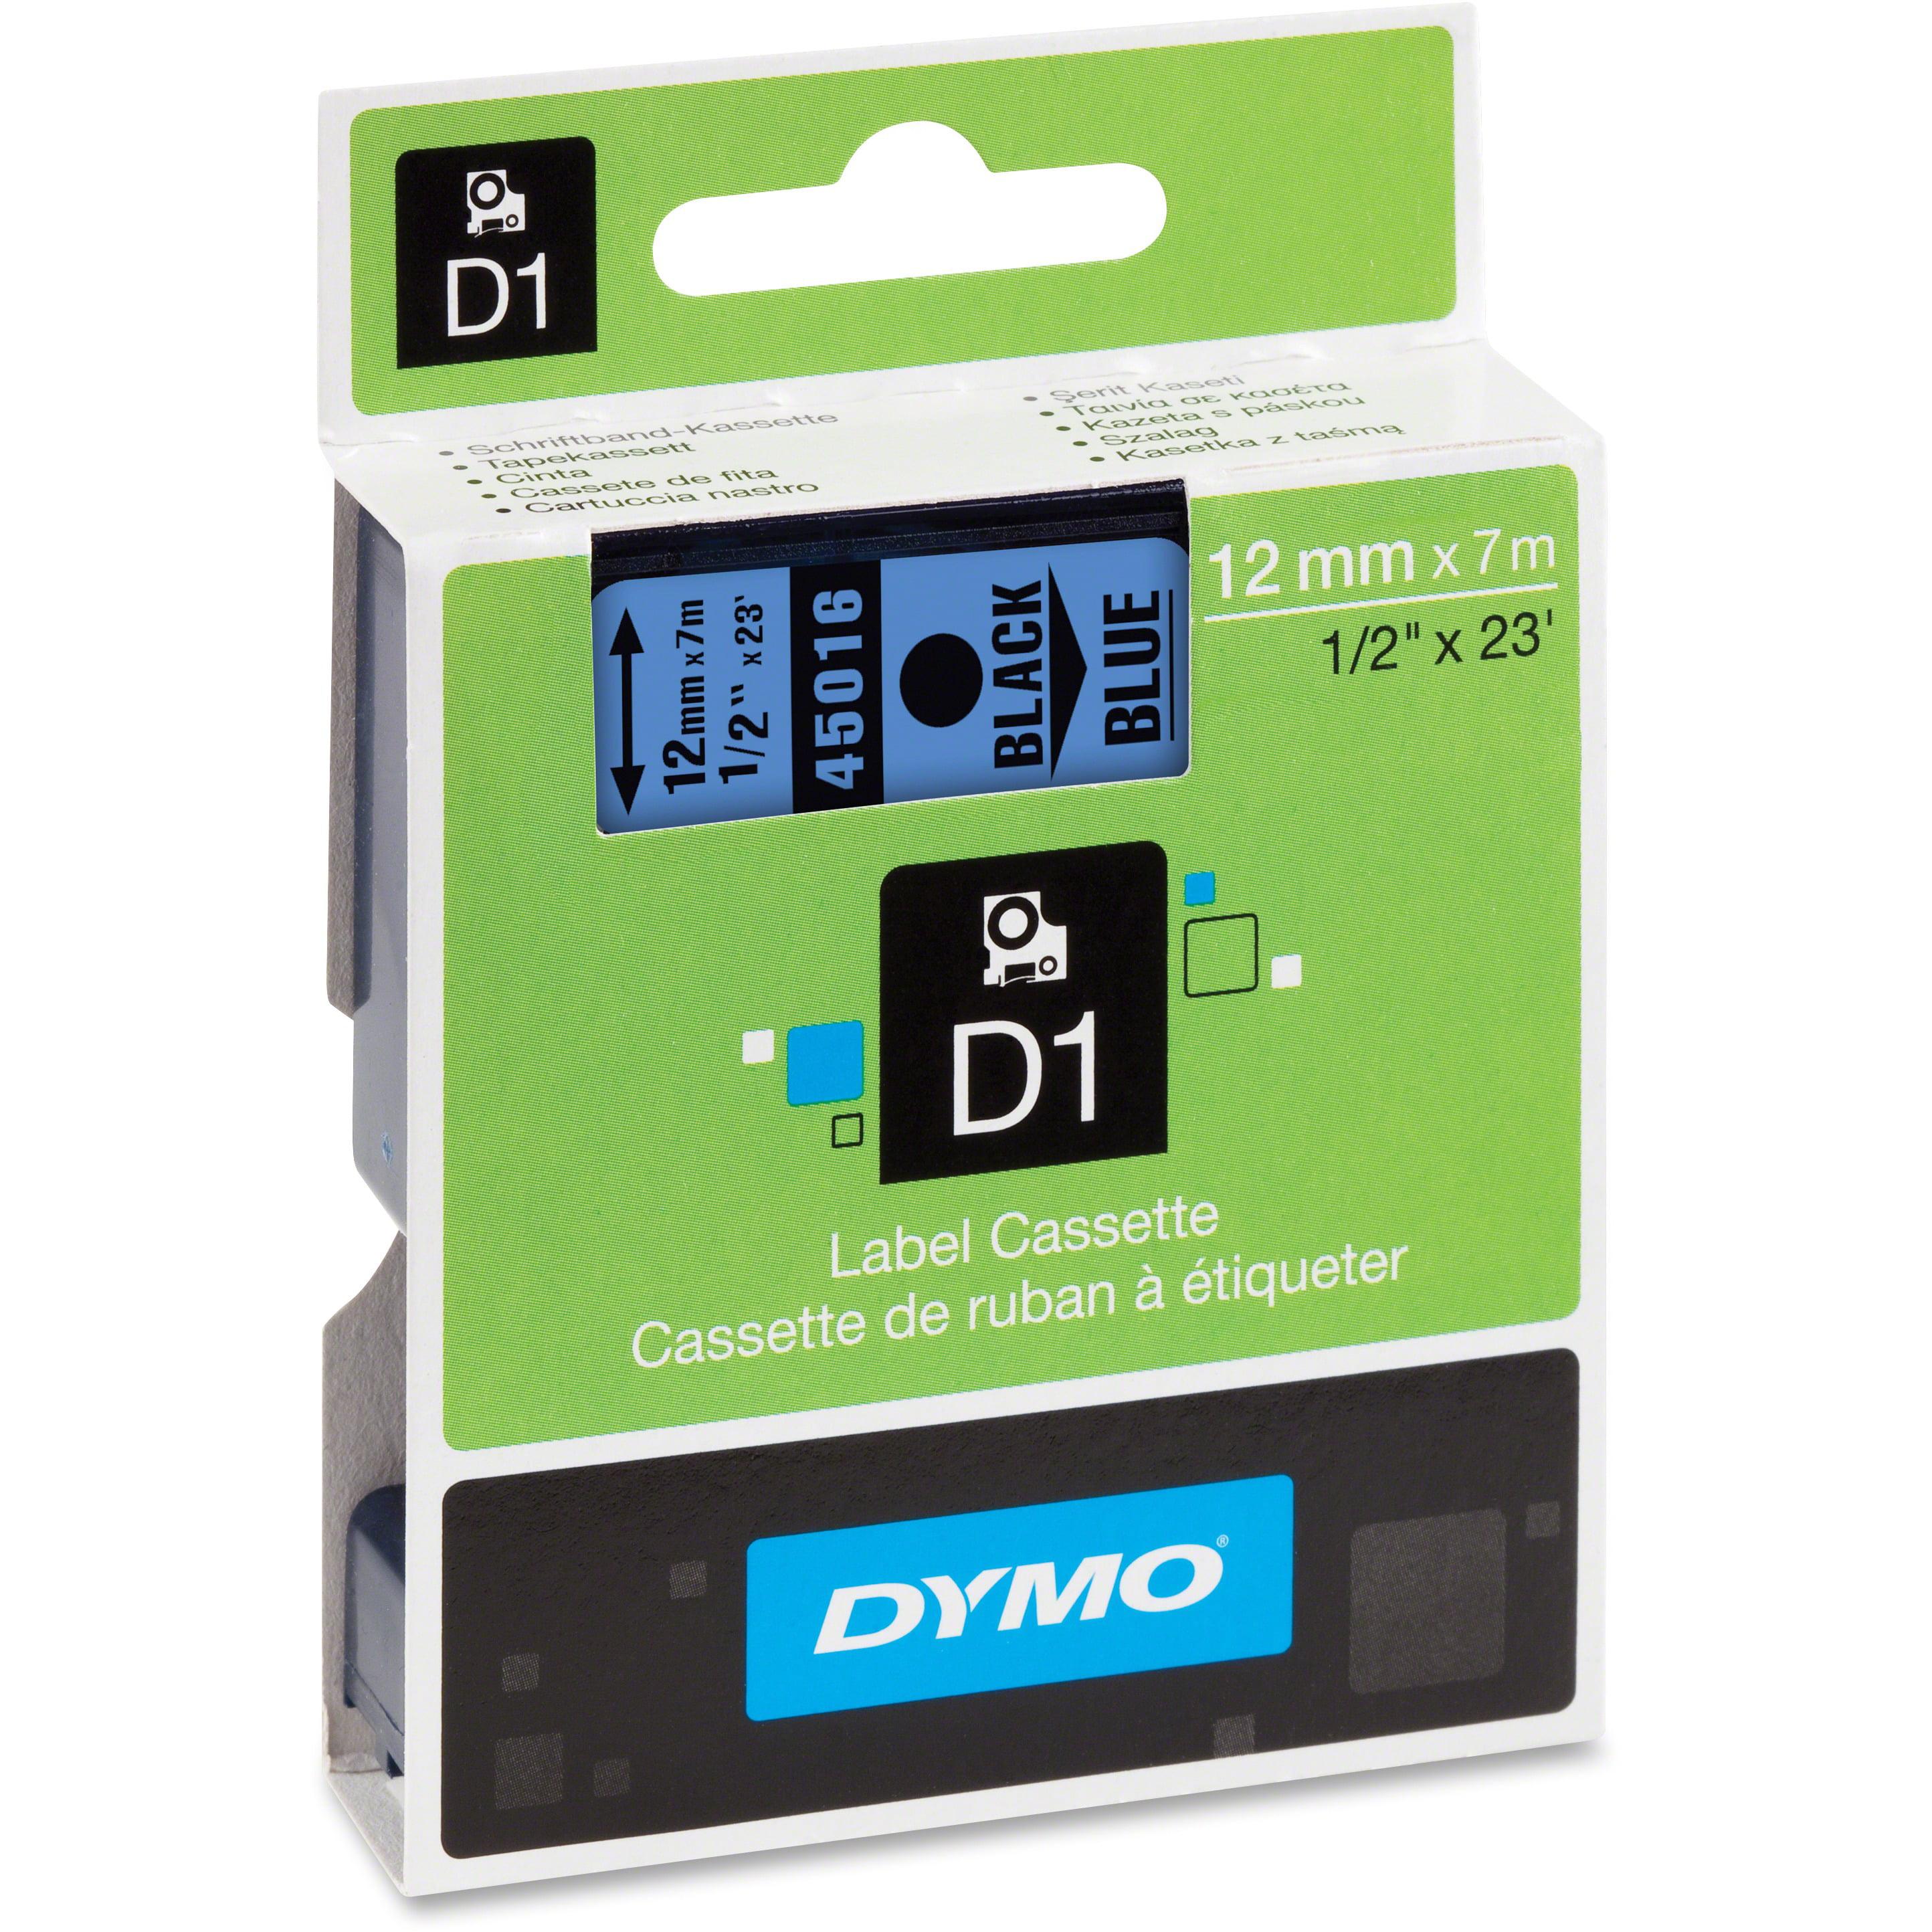 DYMO Standard D1 45016 Labeling Tape ( Black Print on Blue Tape , 1/2'' W x 23' L , 1 Cartridge)